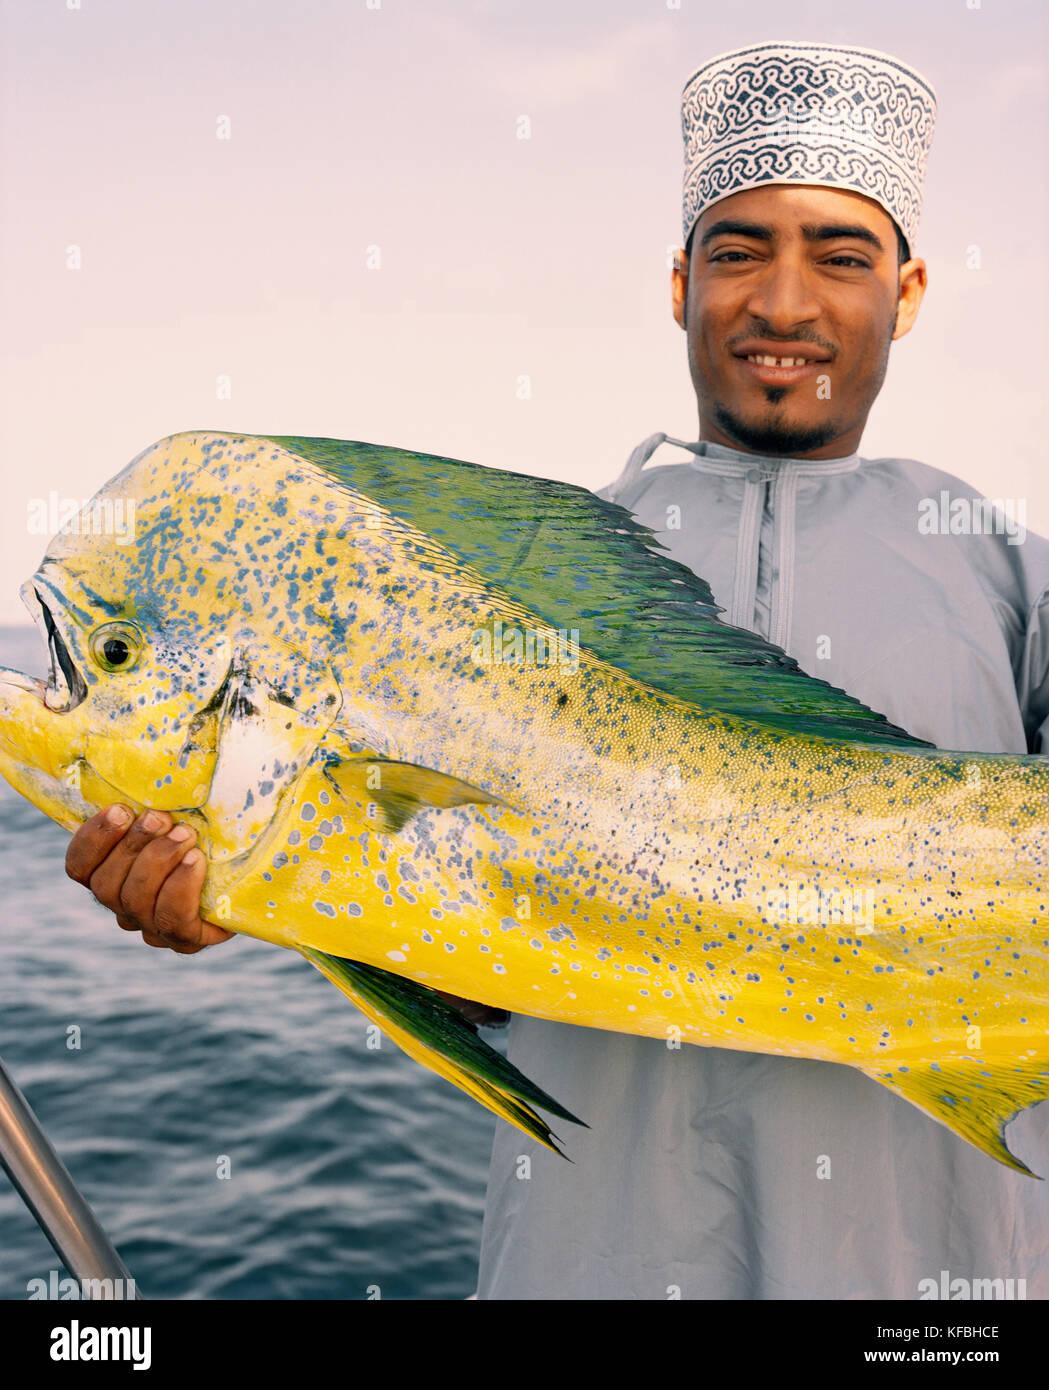 OMAN, Muscat, man holding mahi mahi fish, portrait - Stock Image